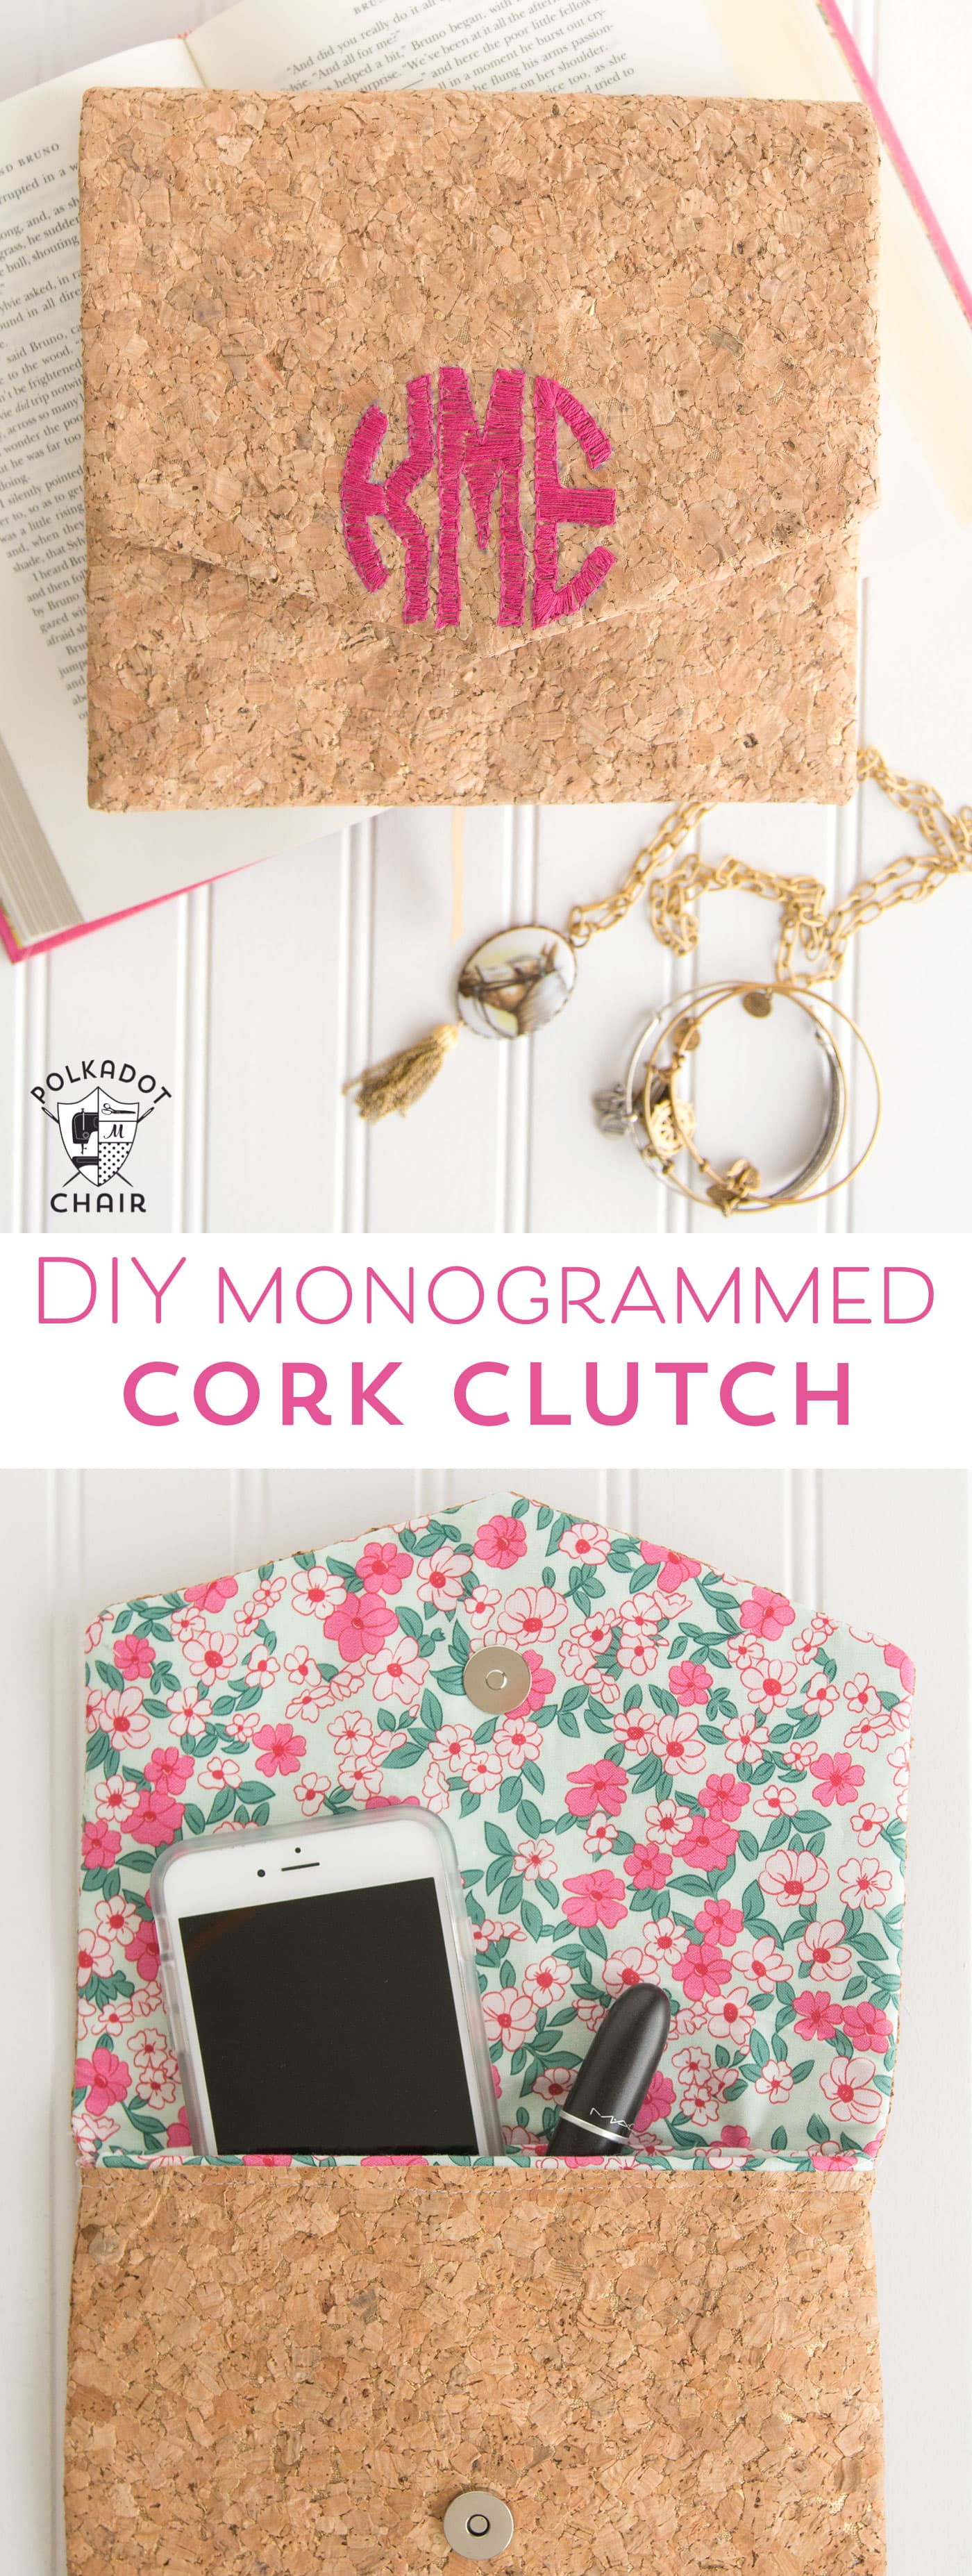 DIY Monogrammed Cork Clutch Tutorial  The Polka Dot Chair